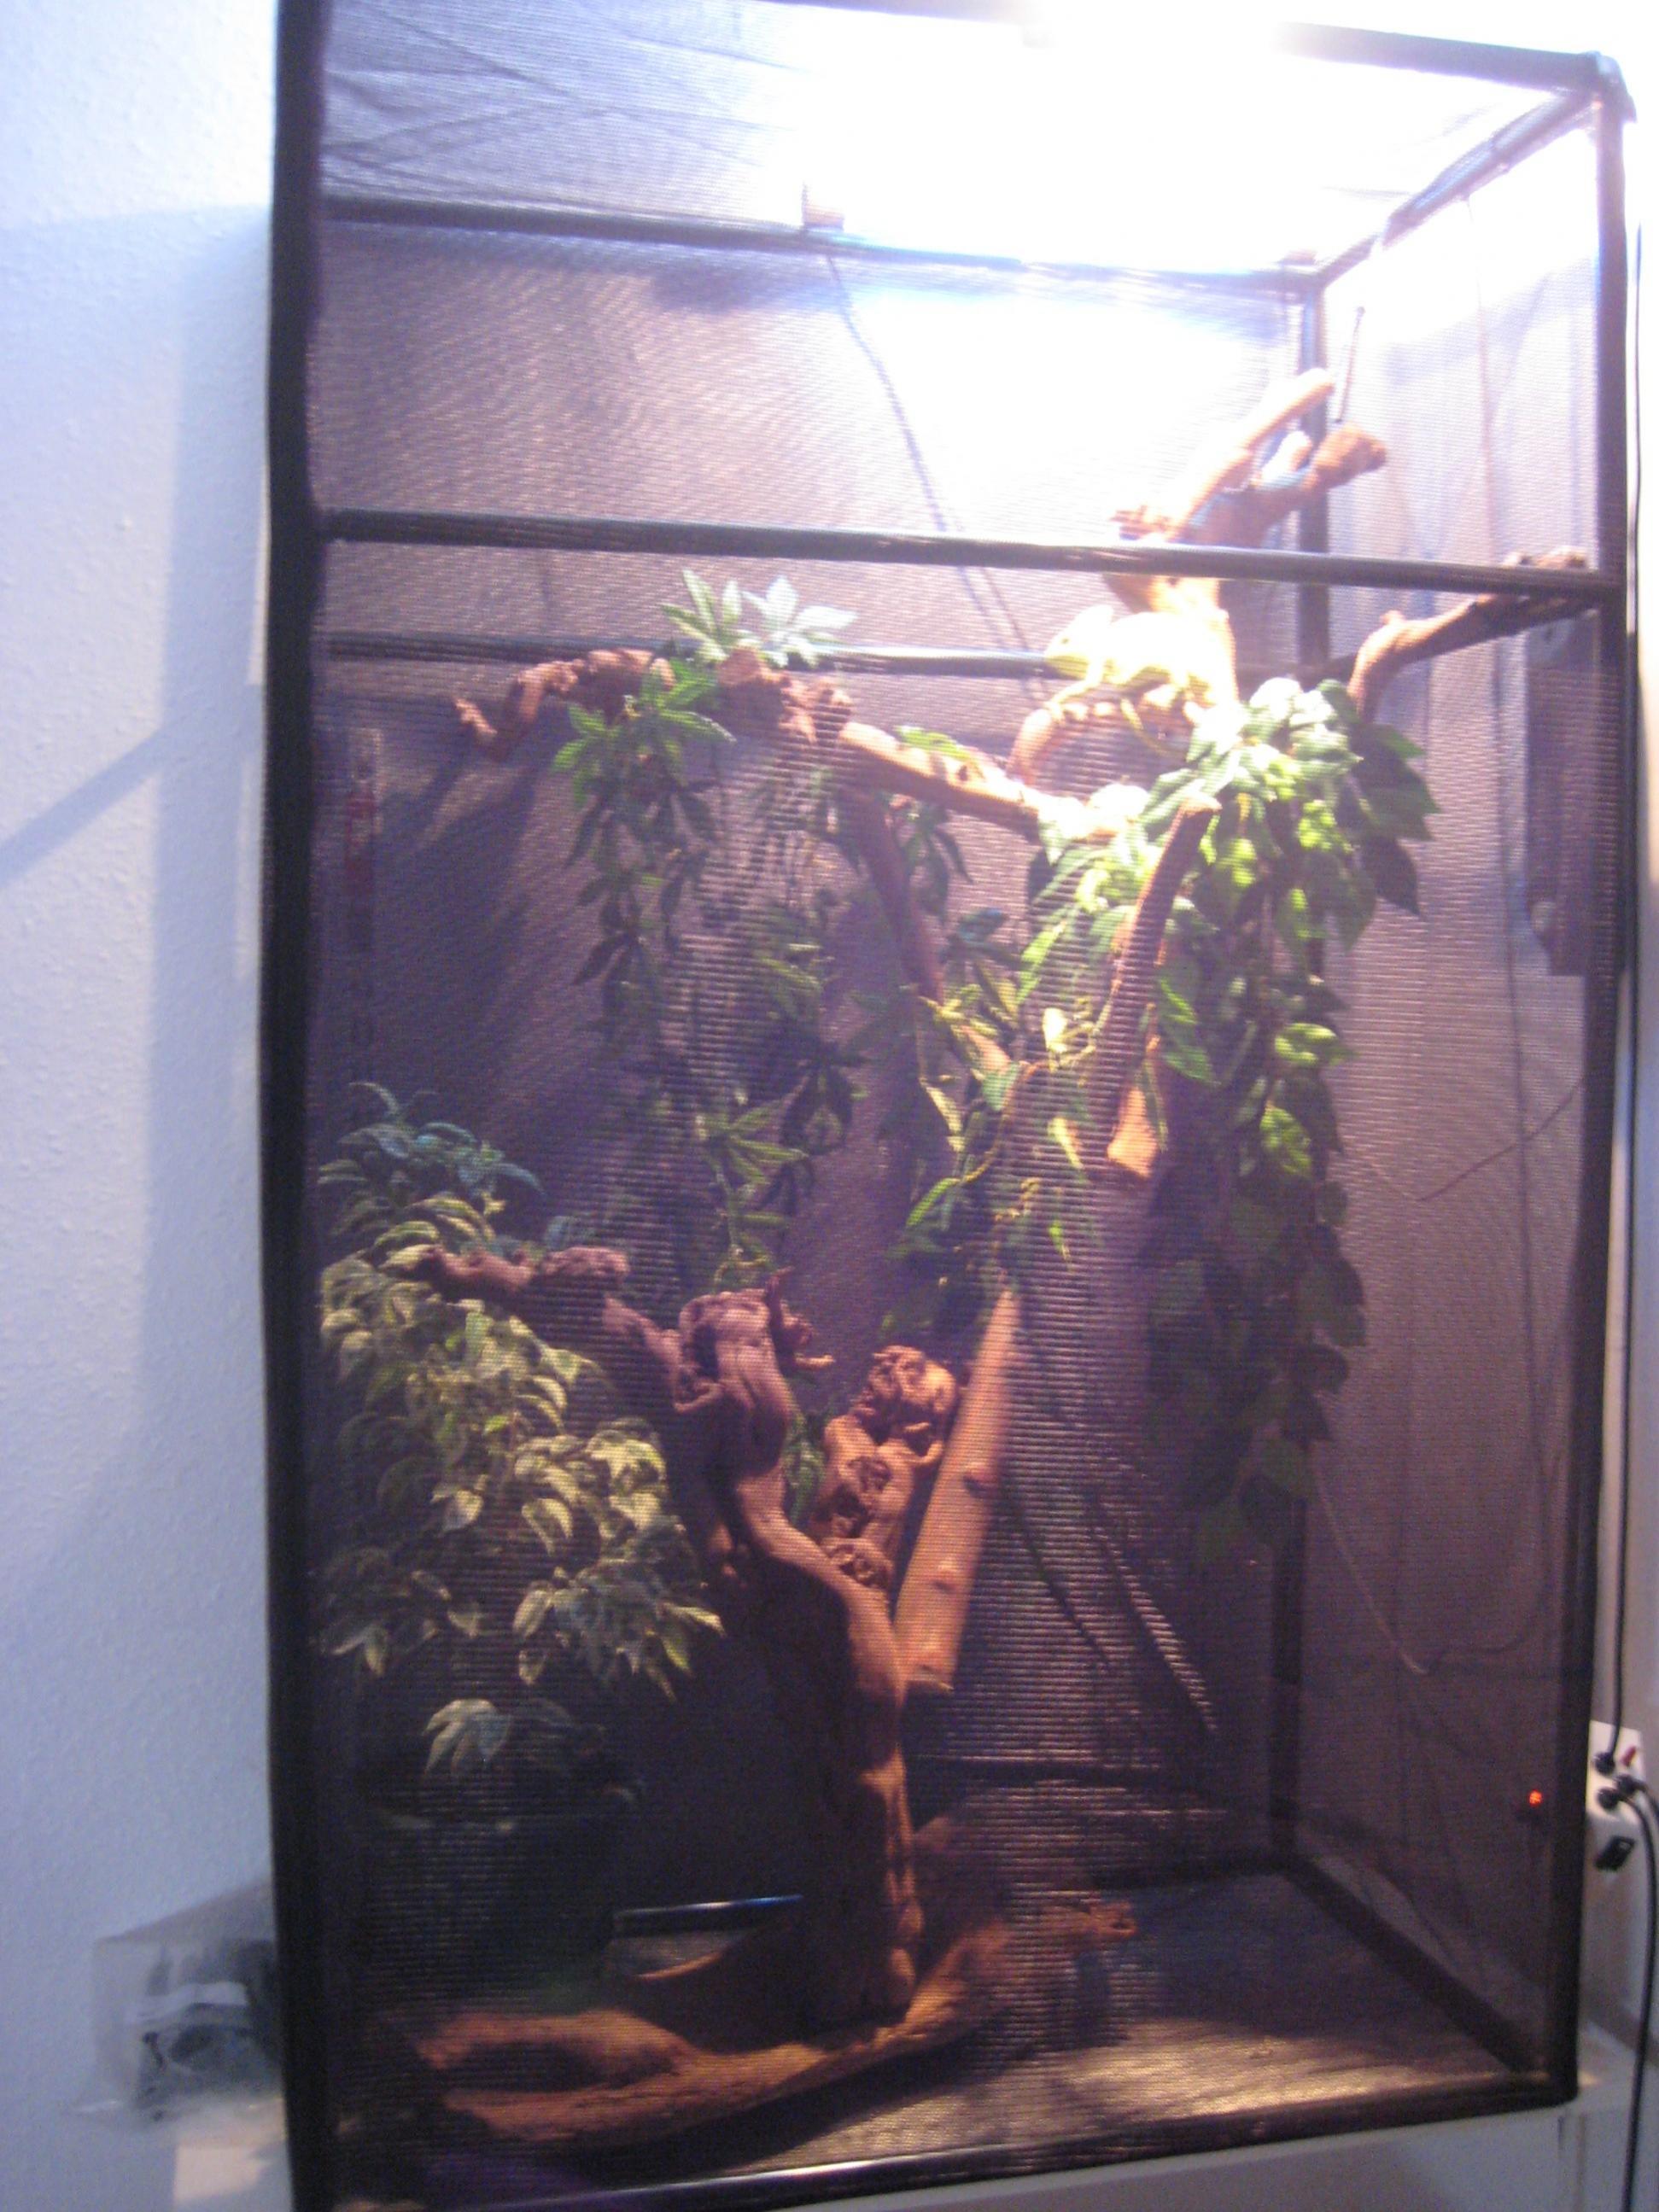 Nw England Yemen Cham With Full Flexarium Setup Reptile Forums